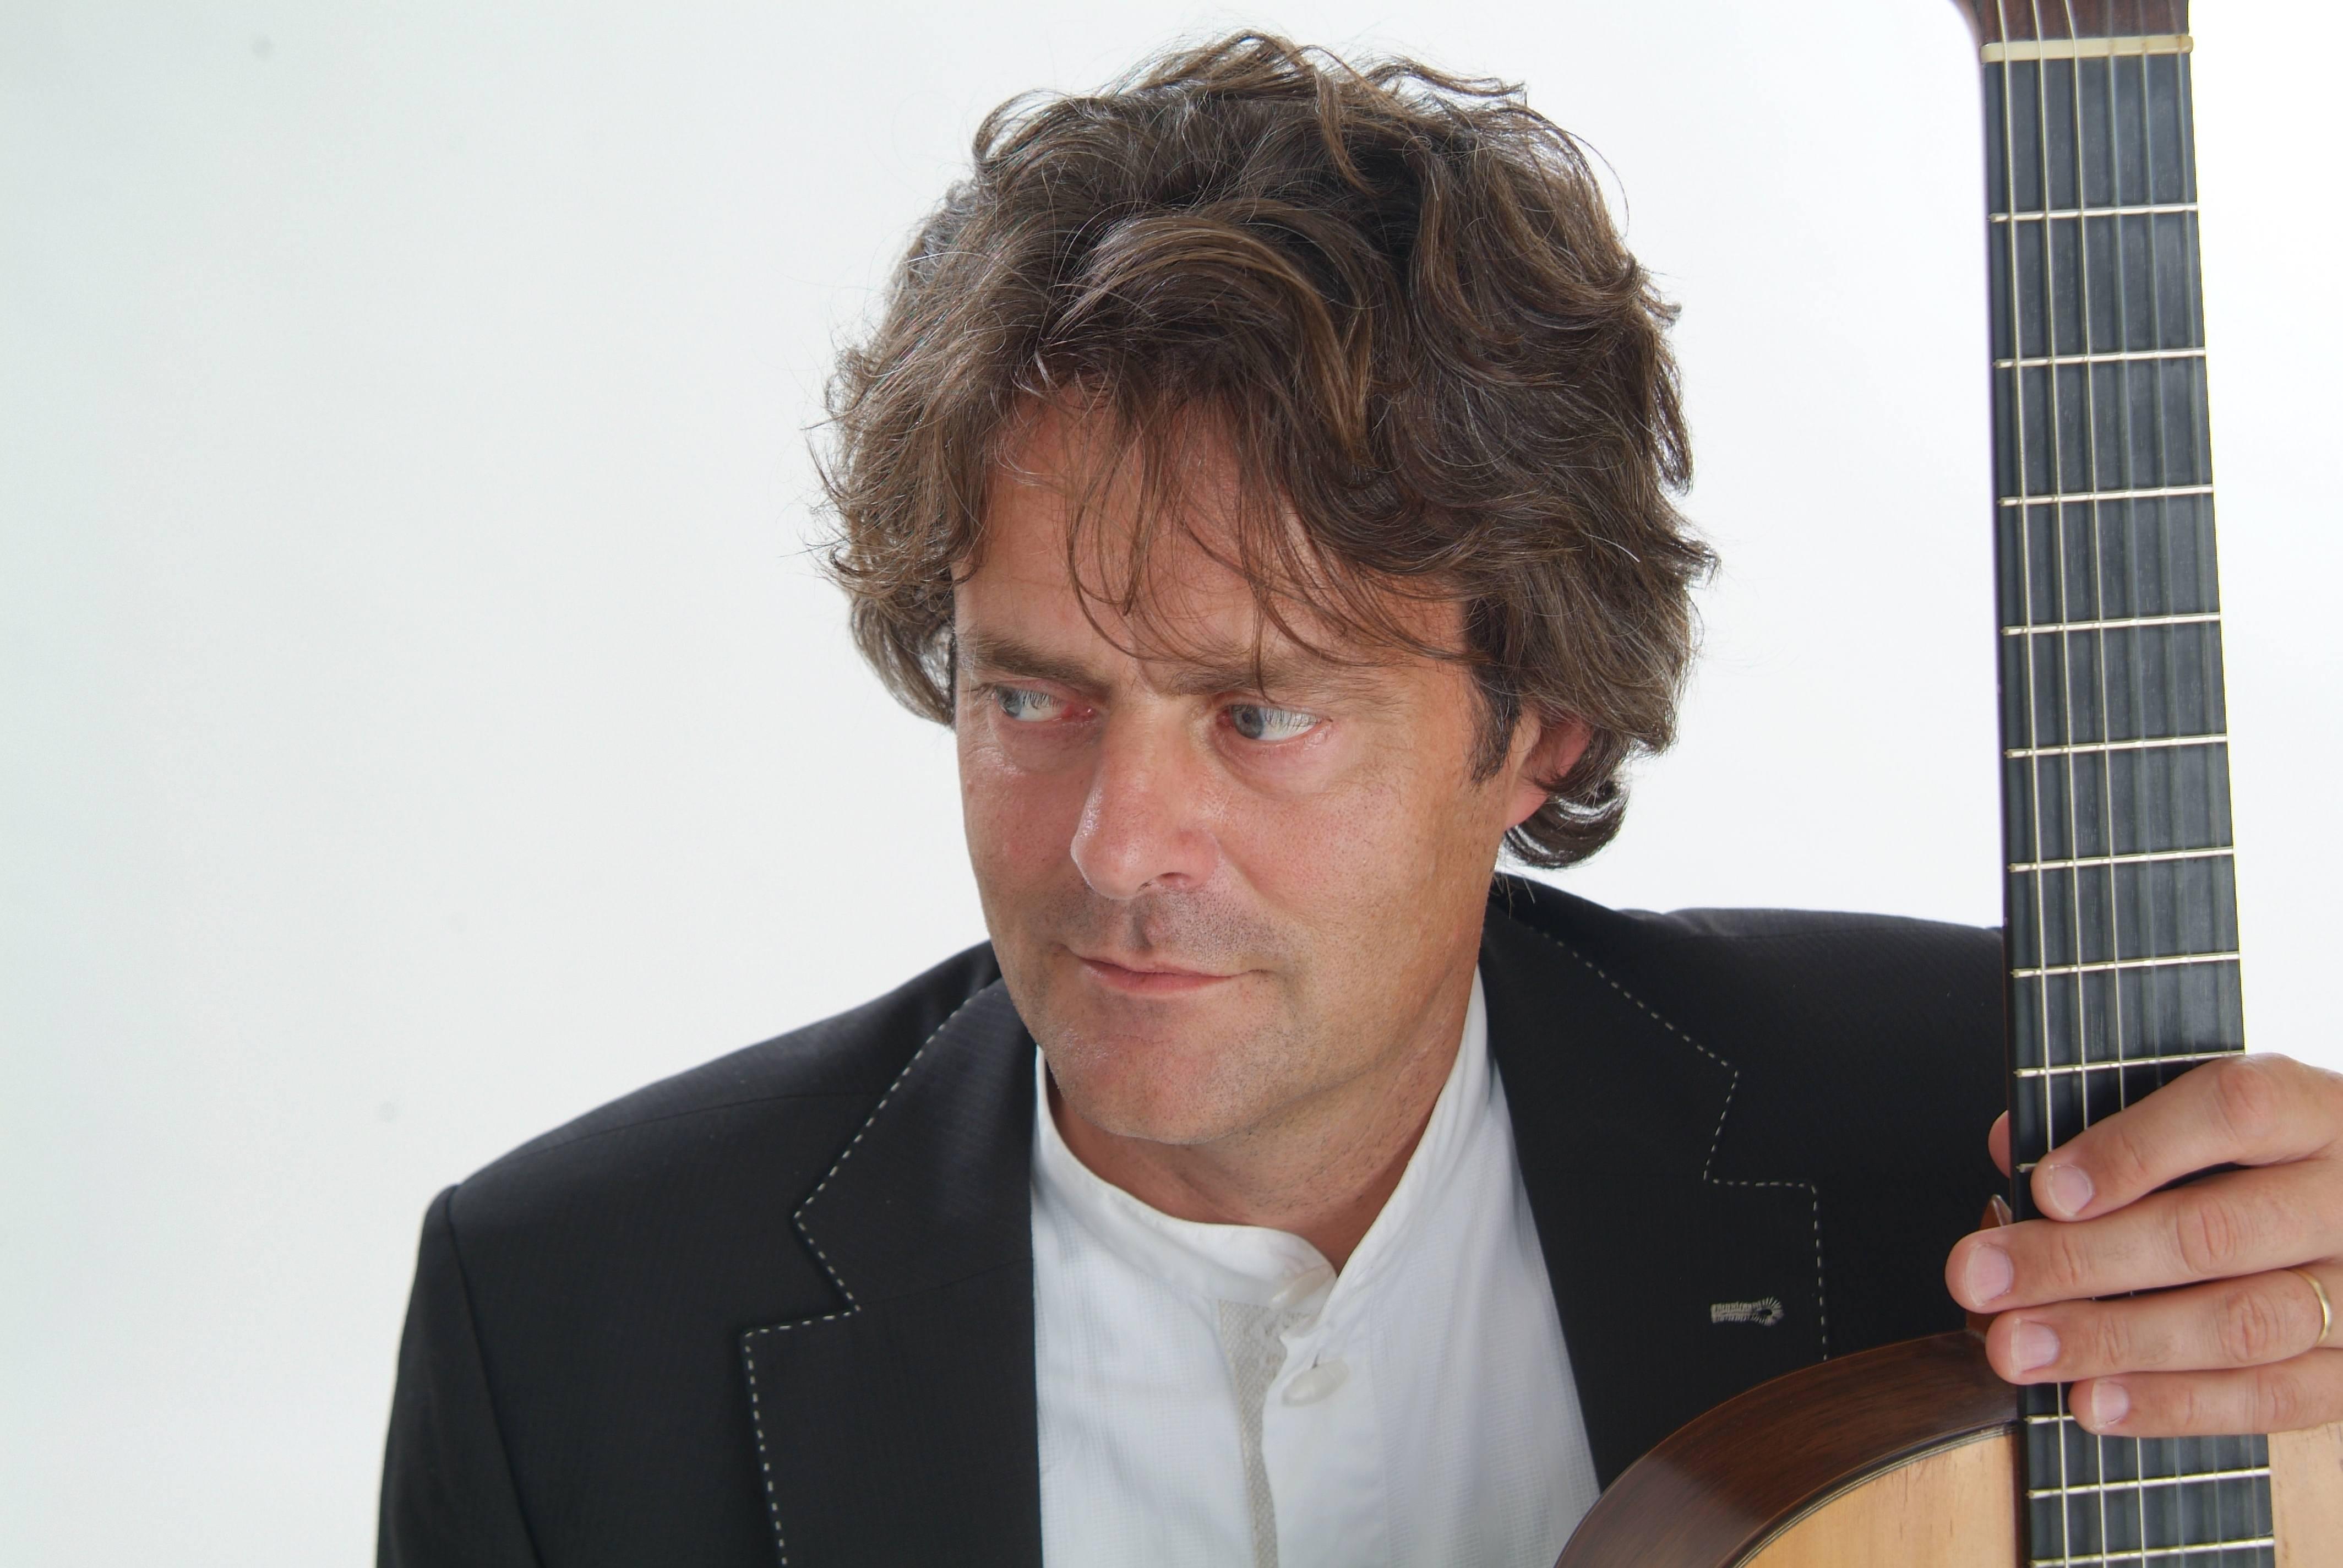 Enno Voorhorst pictures